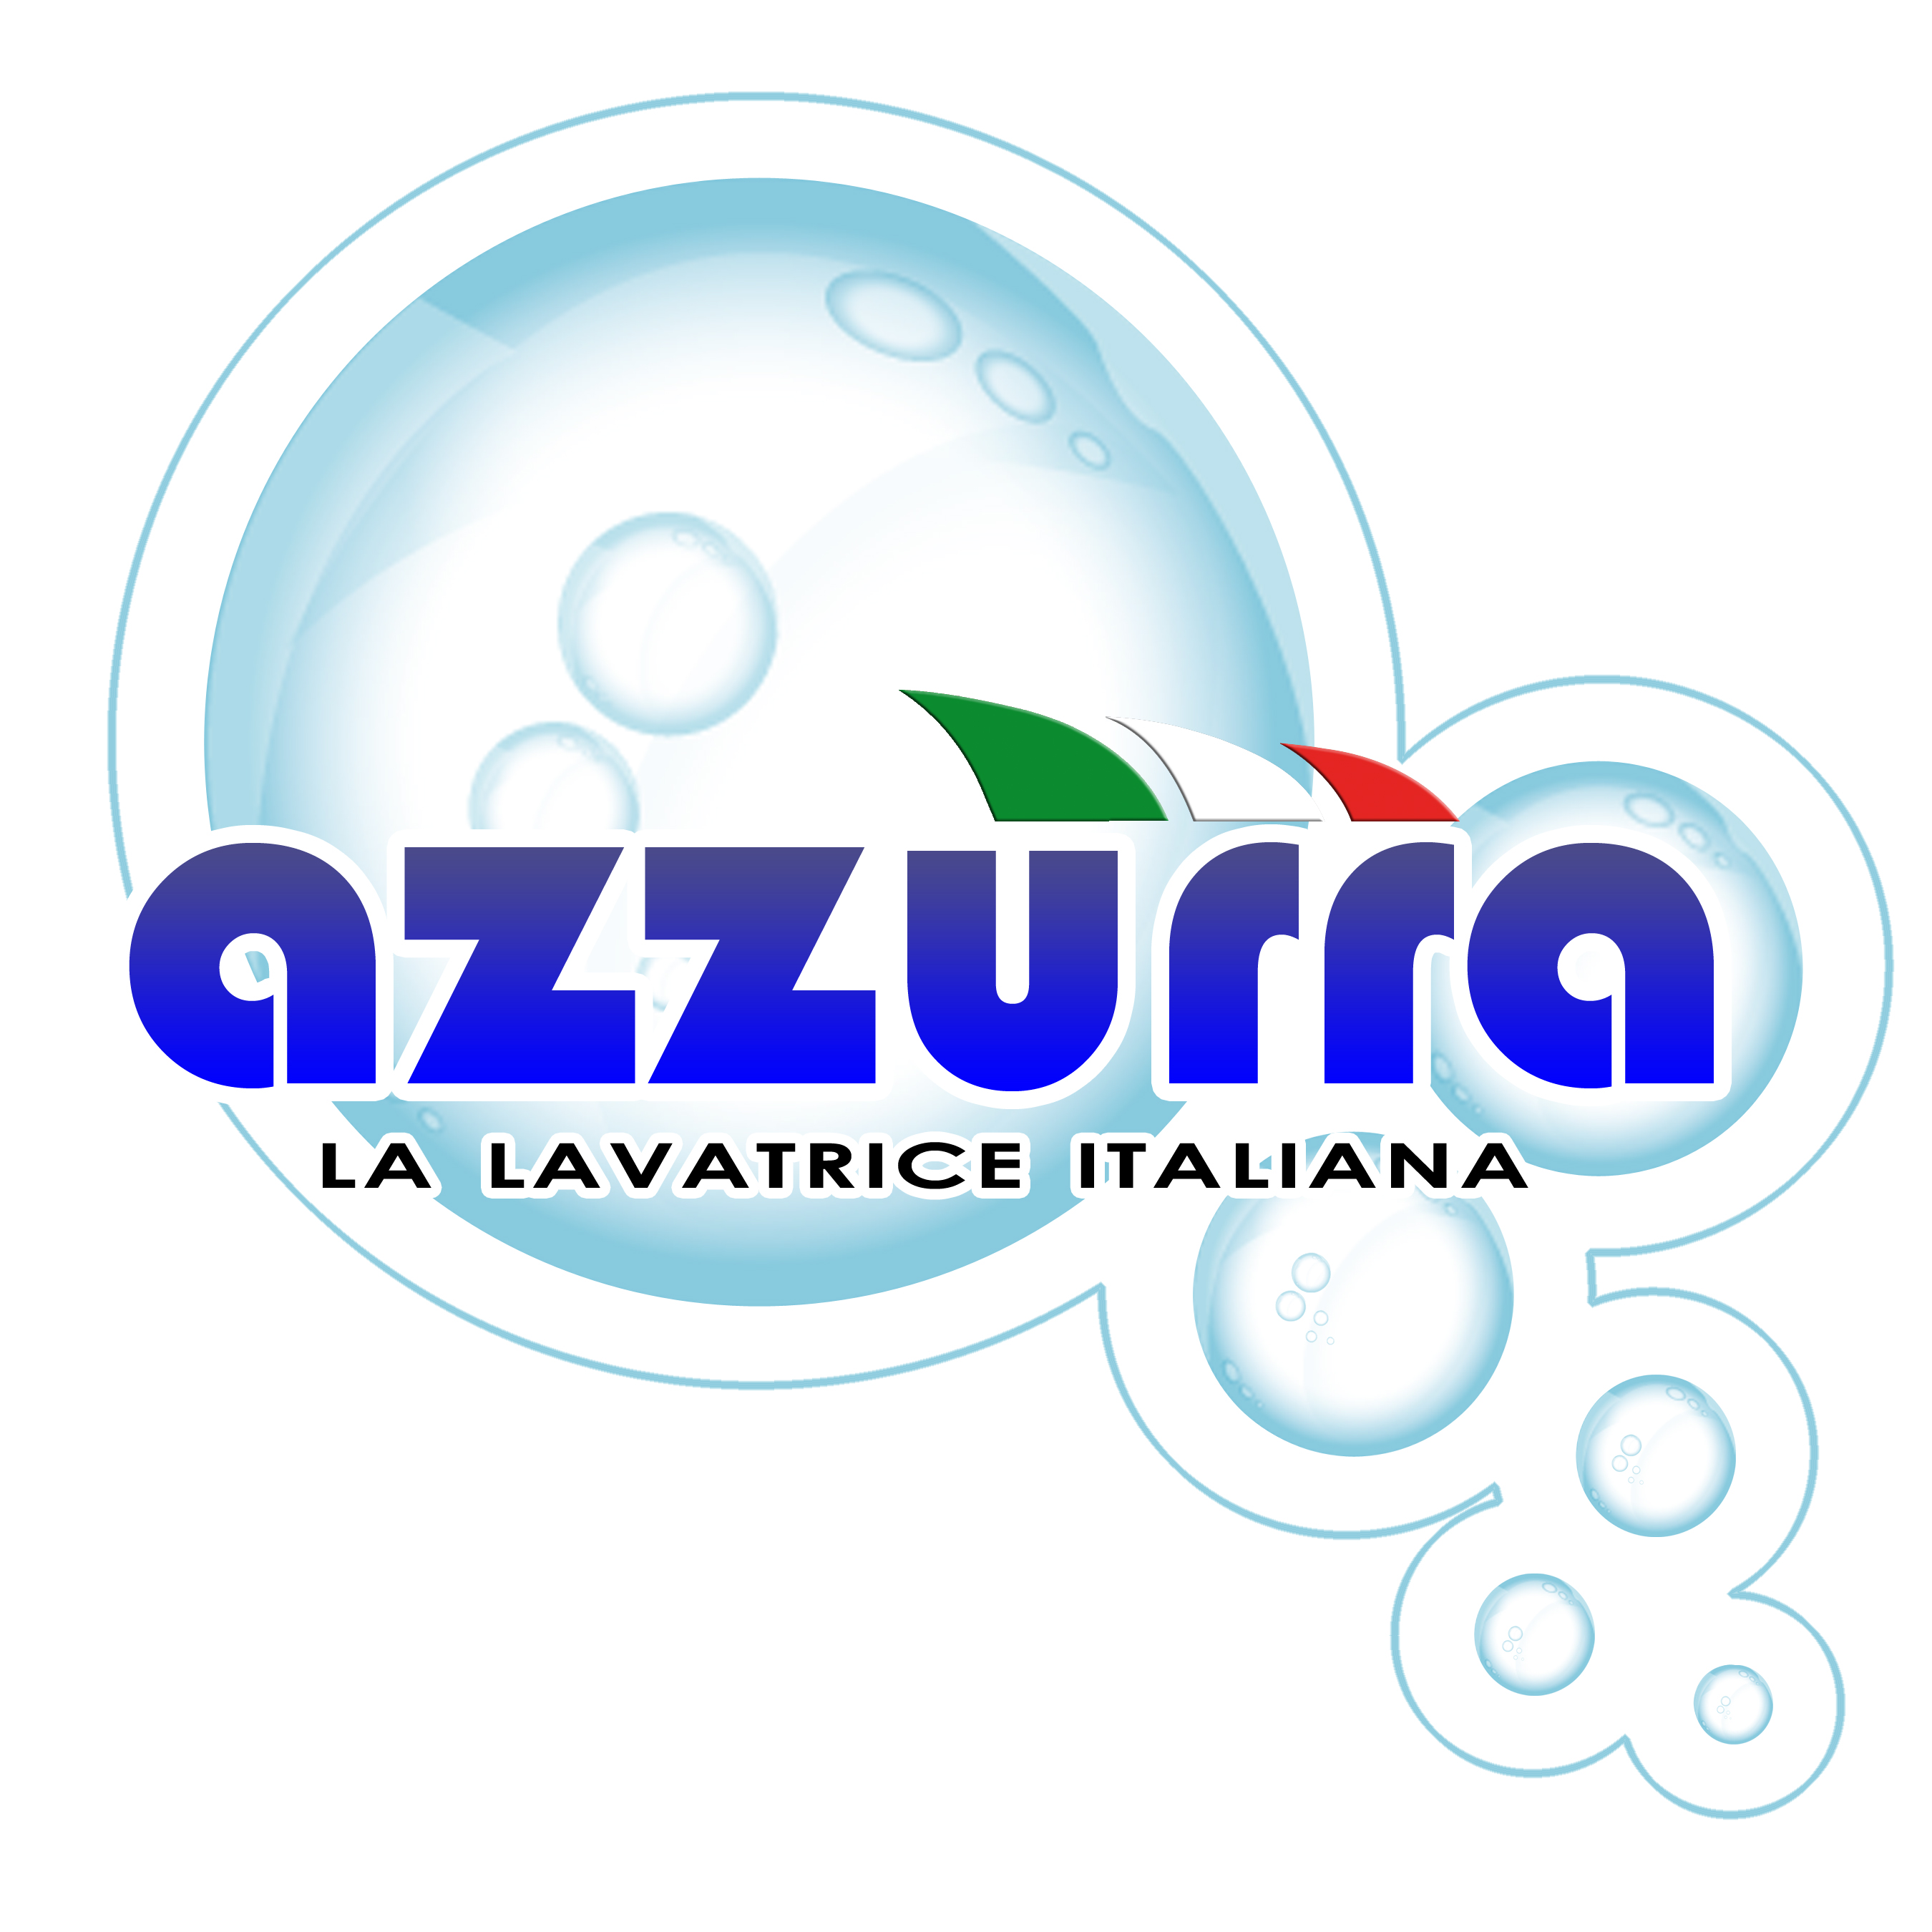 ElettroHouse® Group - Official website - Italiana Elettrodomestici ...